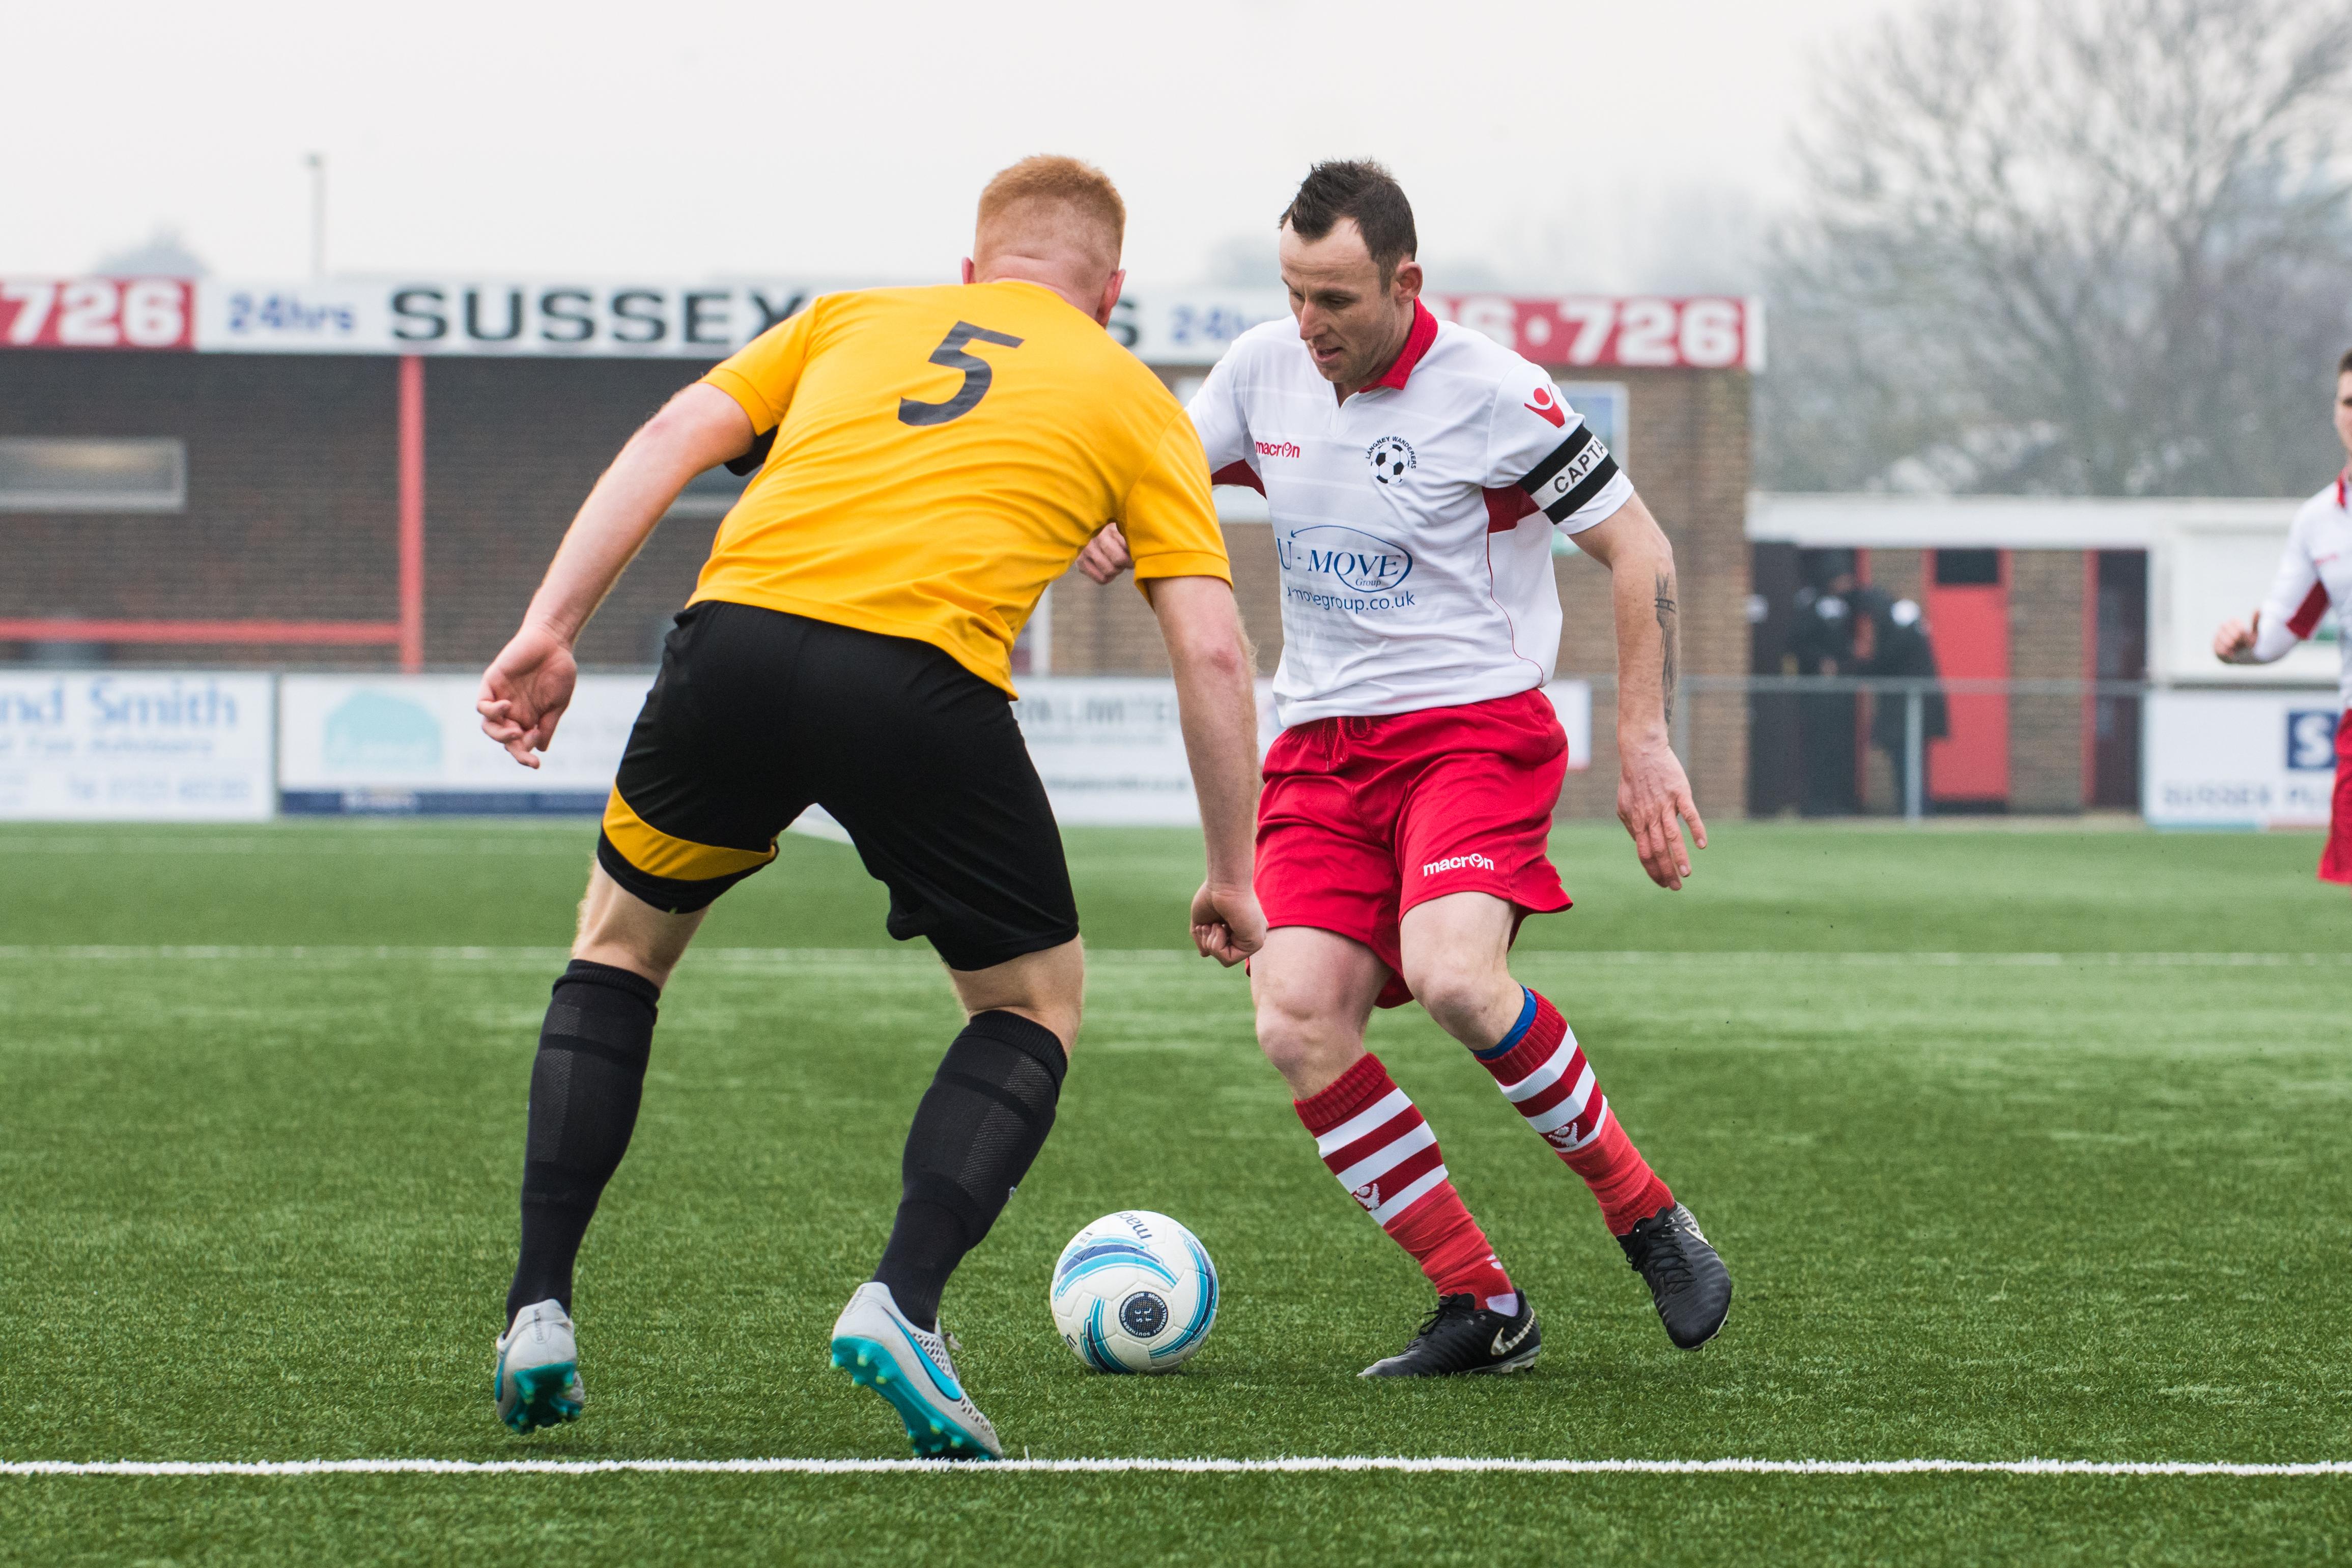 DAVID_JEFFERY Langney Wanderers FC vs Bexhill United FC 03.03.18 34